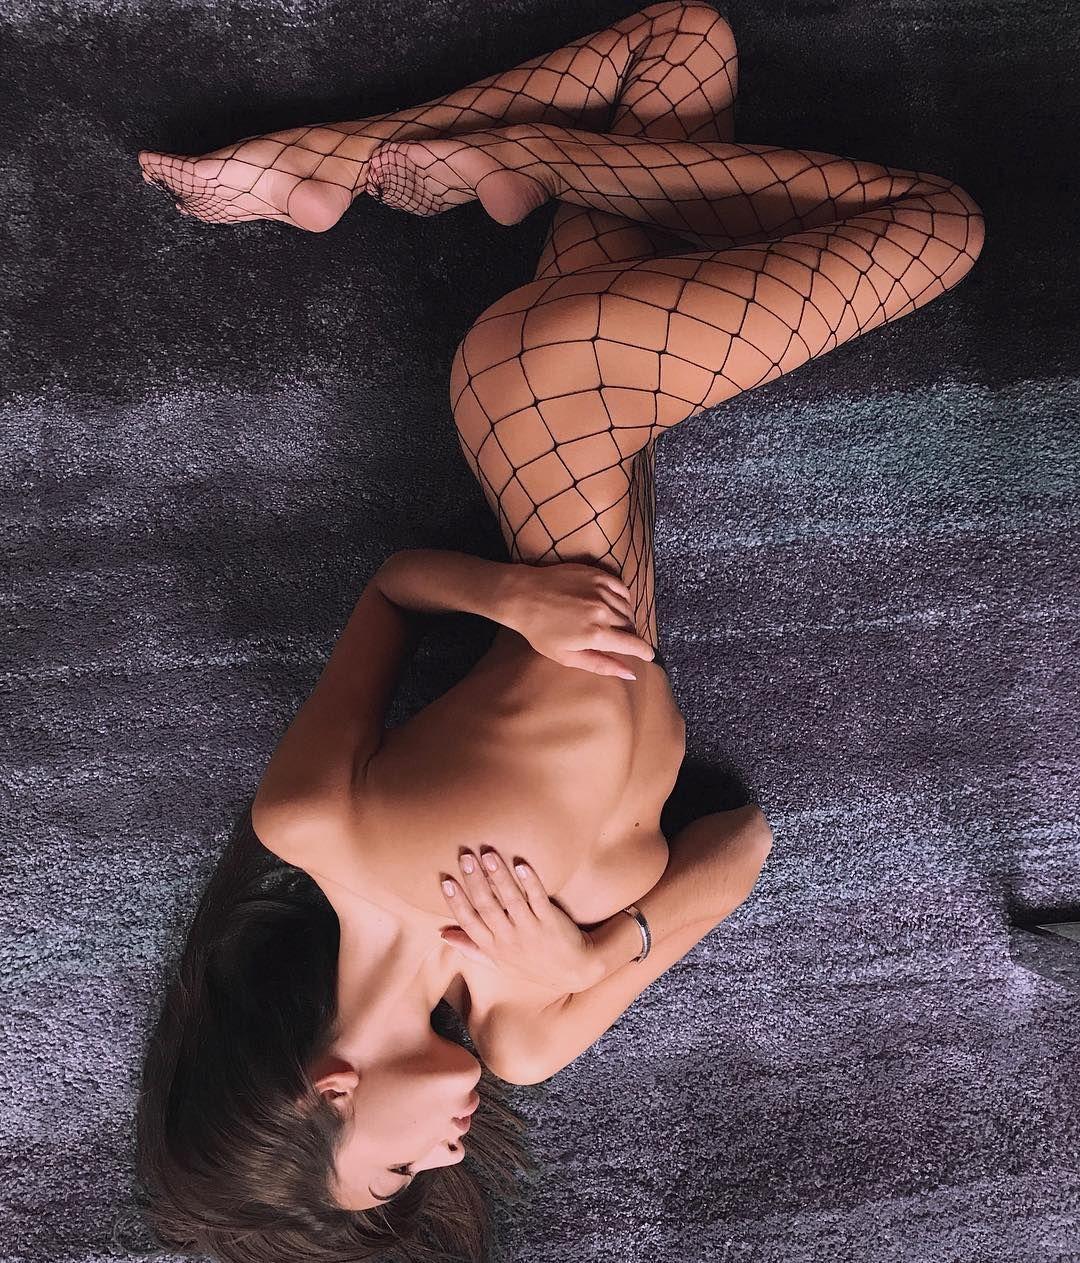 Sexy Dasha Gaivoronski nudes (13 photos), Pussy, Hot, Boobs, cameltoe 2019